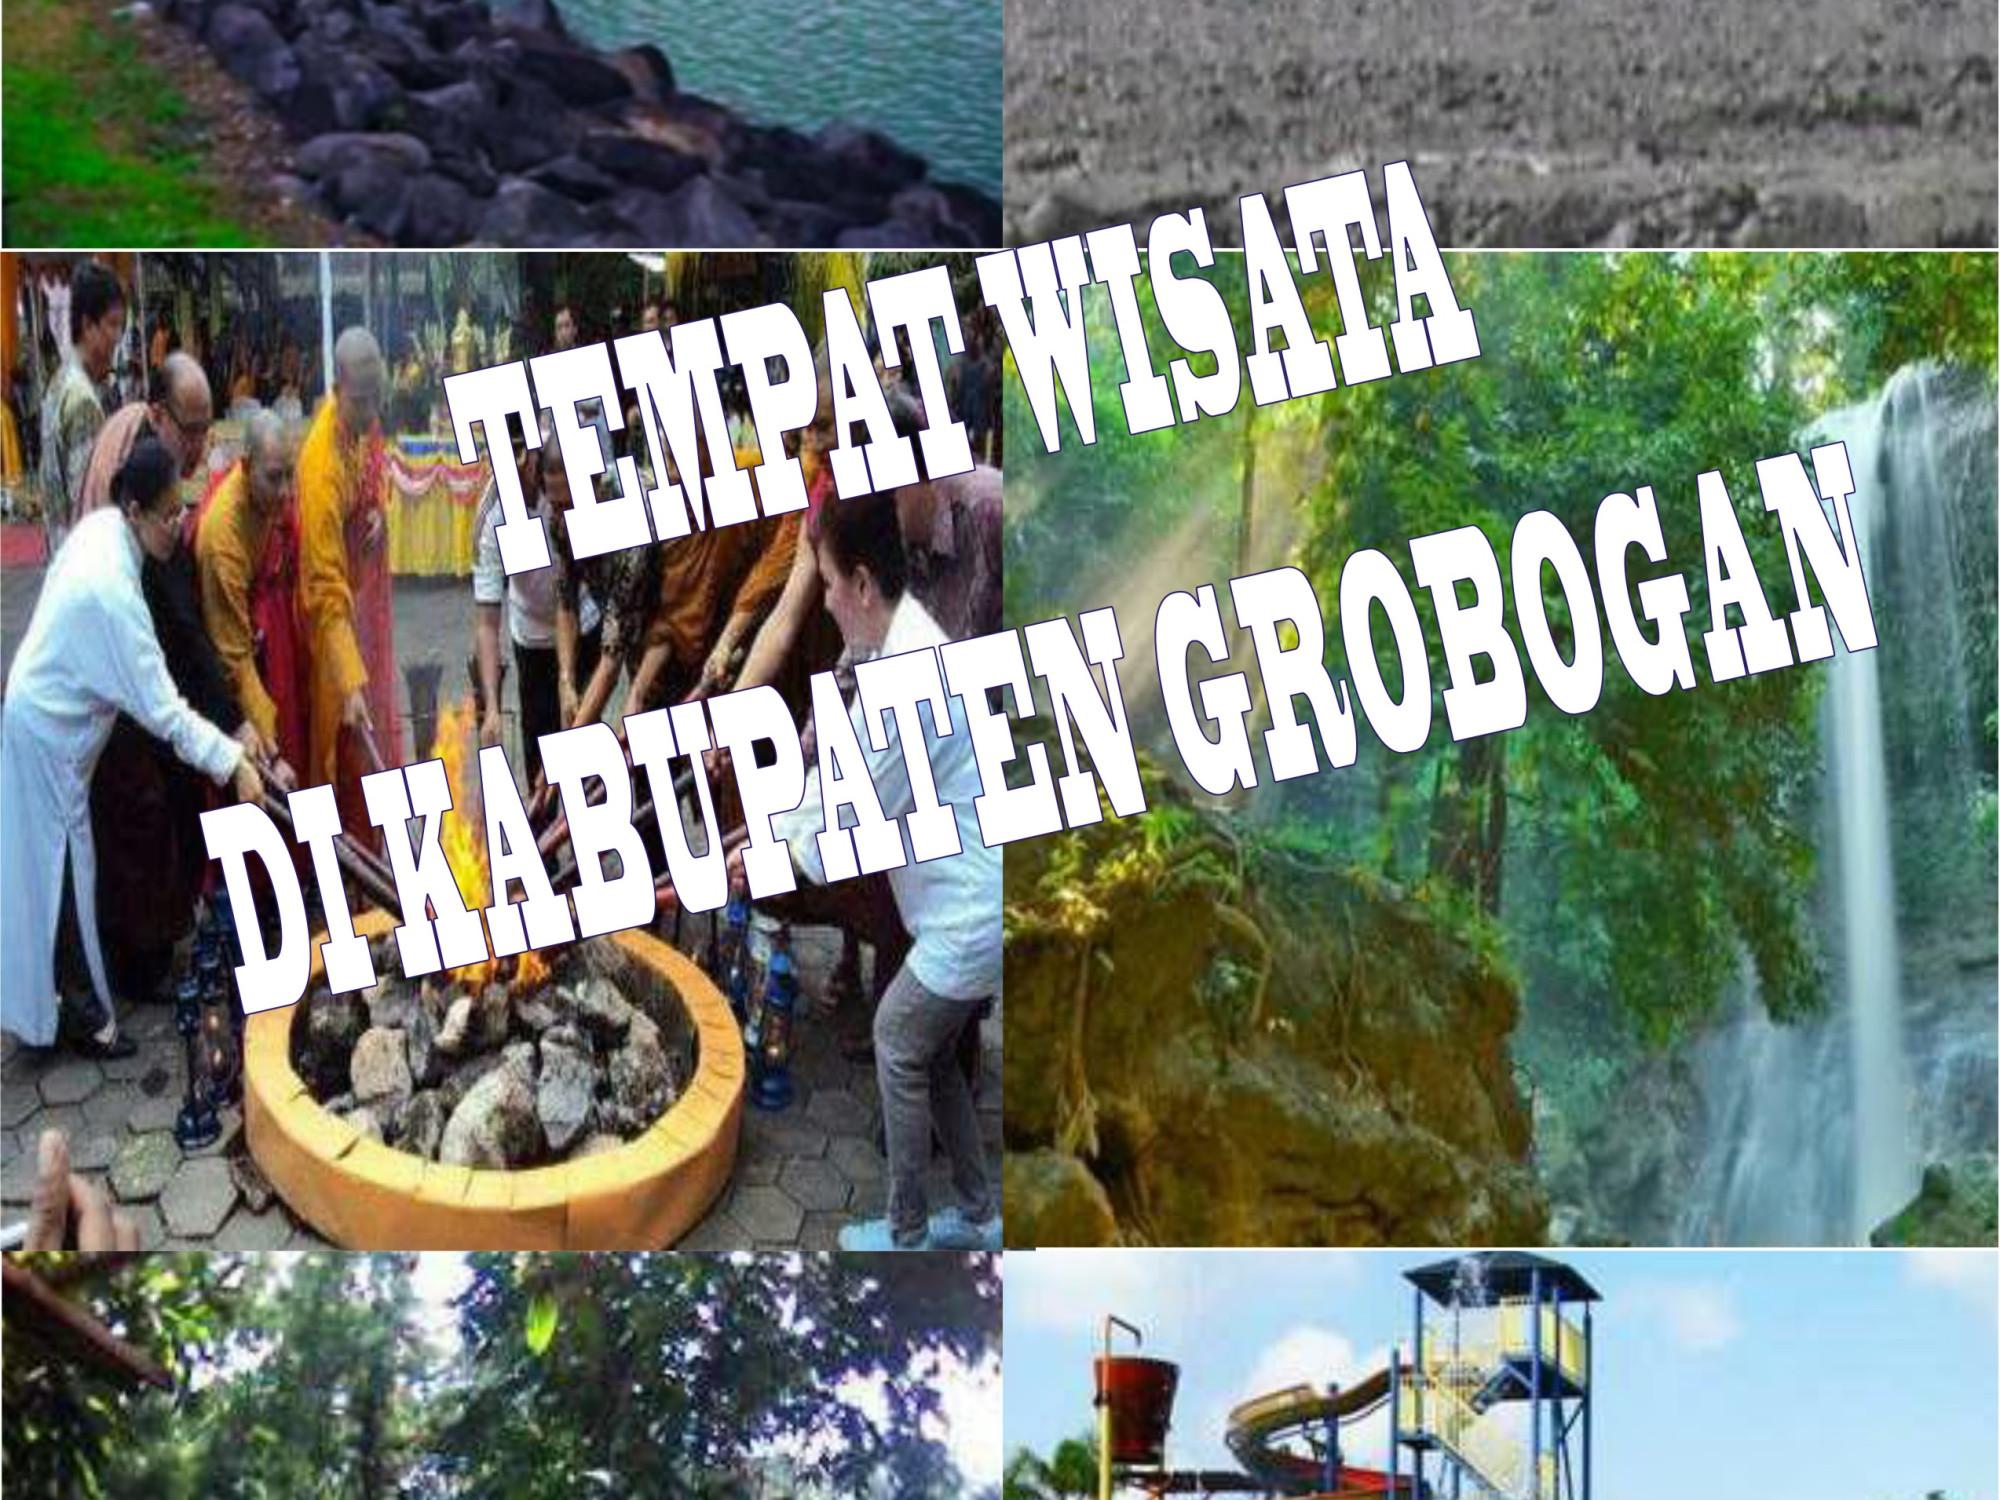 Daya Tarik Wisata Unik Kabupaten Grobogan Supraptobpn March 3 2016